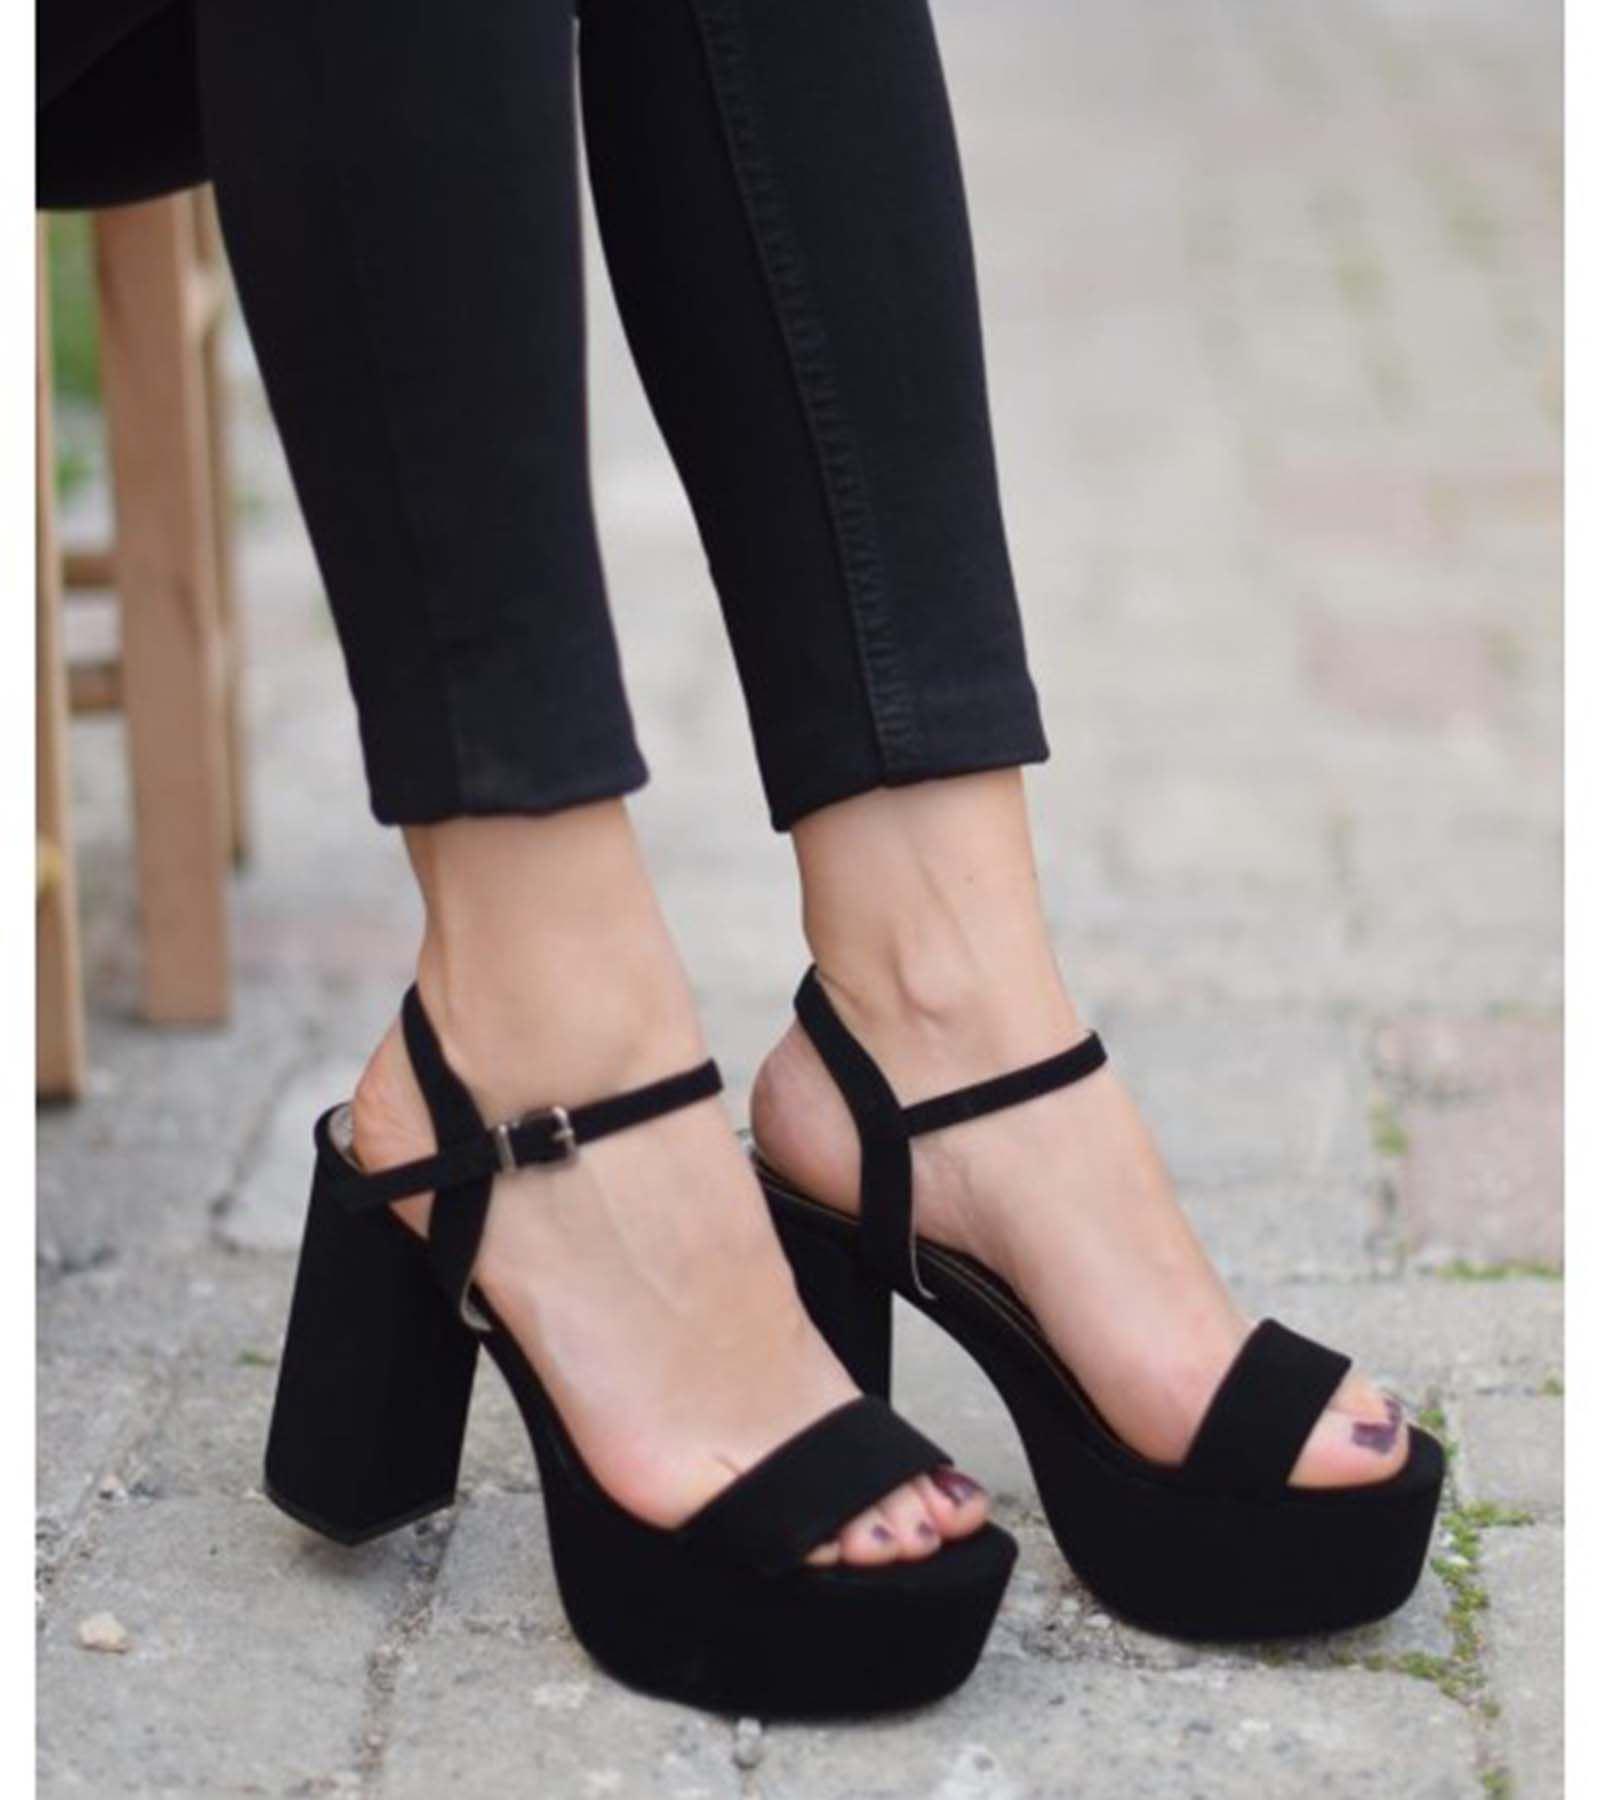 Marie Yüksek Topuk Süet Ayakkabı Siyah